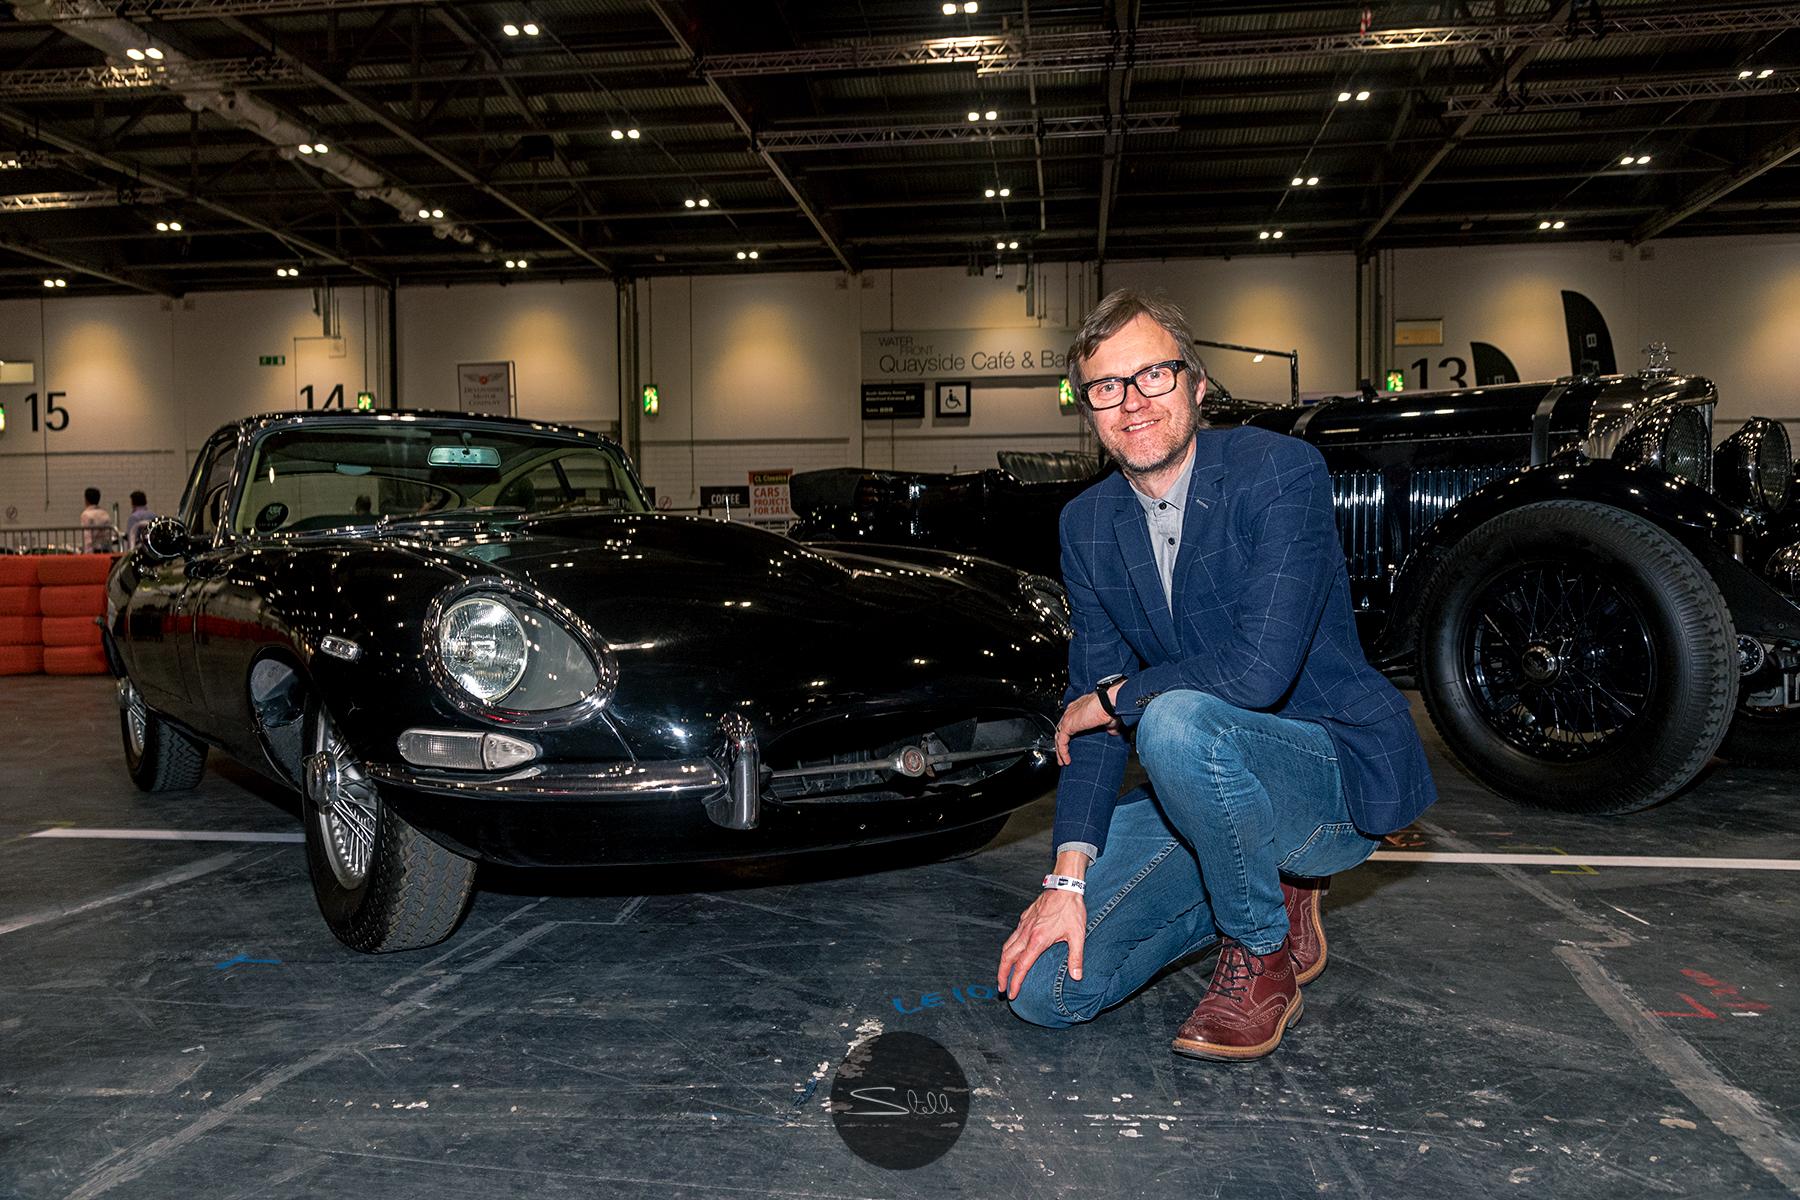 Stella Scordellis London Classic Car Show 2018 23 Watermarked.jpg